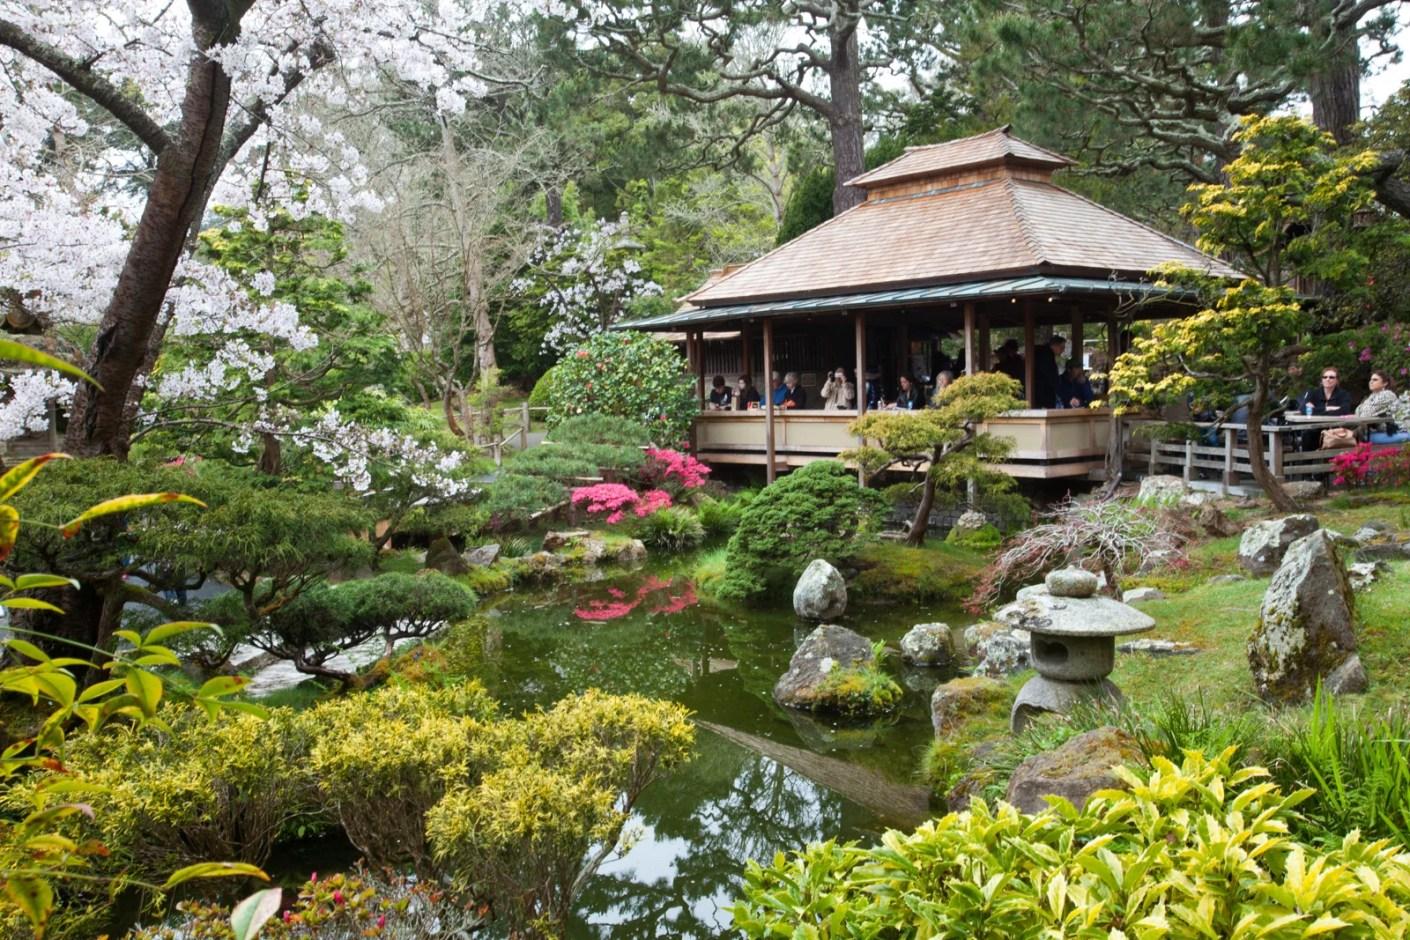 The Japanese Tea Garden at Golden Gate Park (Photo by John S Lander/LightRocket via Getty Images)